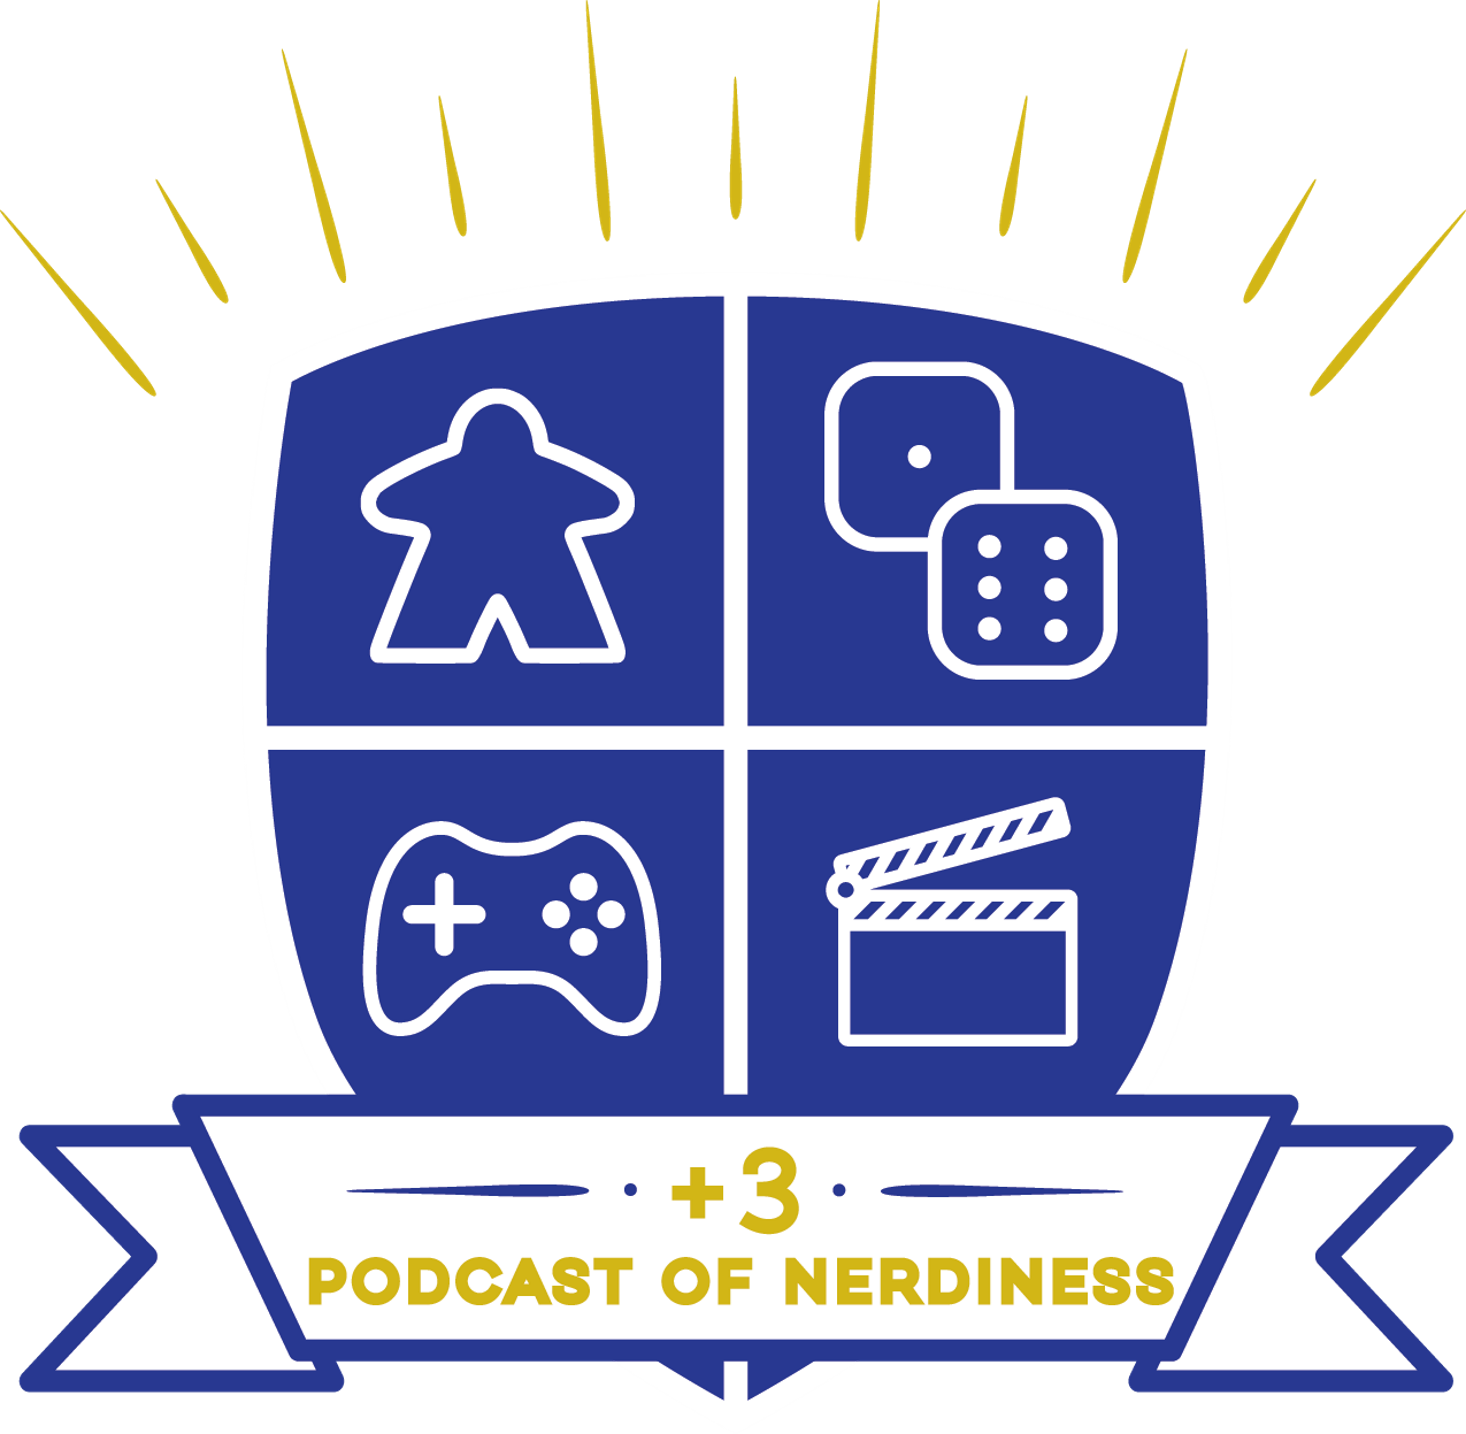 +3 Podcast of Nerdiness